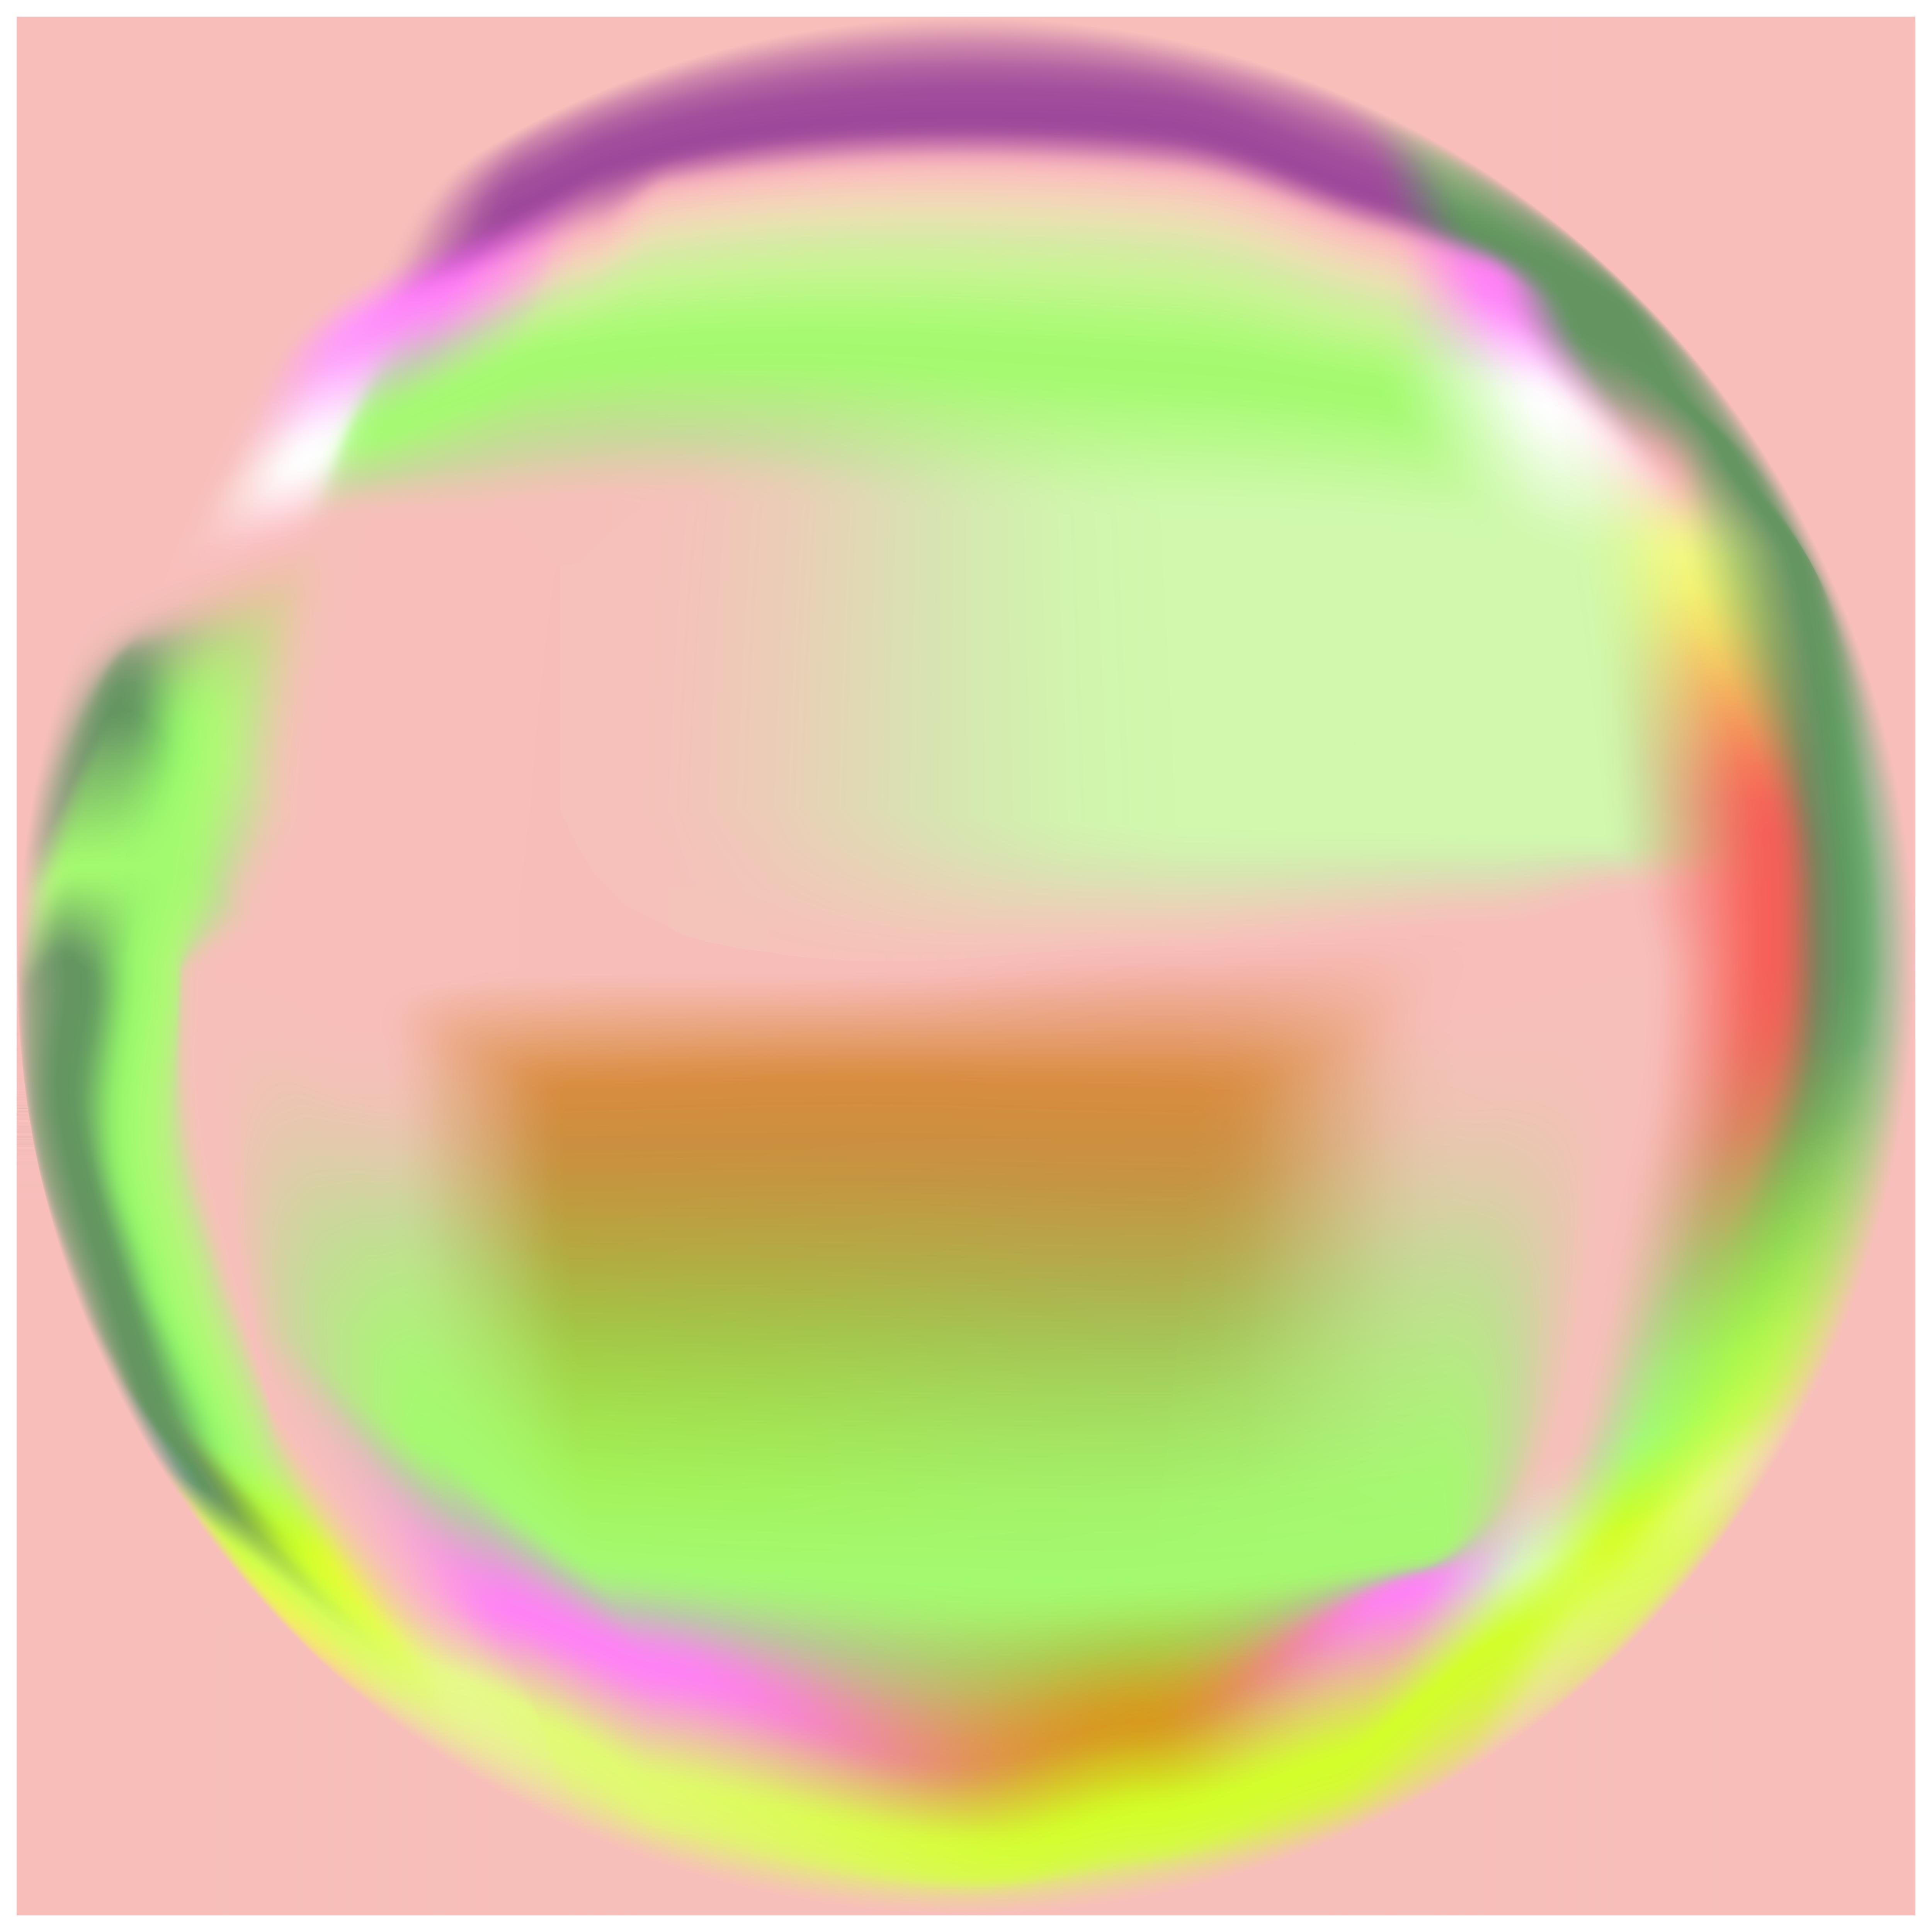 jpg royalty free download Transparent png clip art. Bubble clipart.